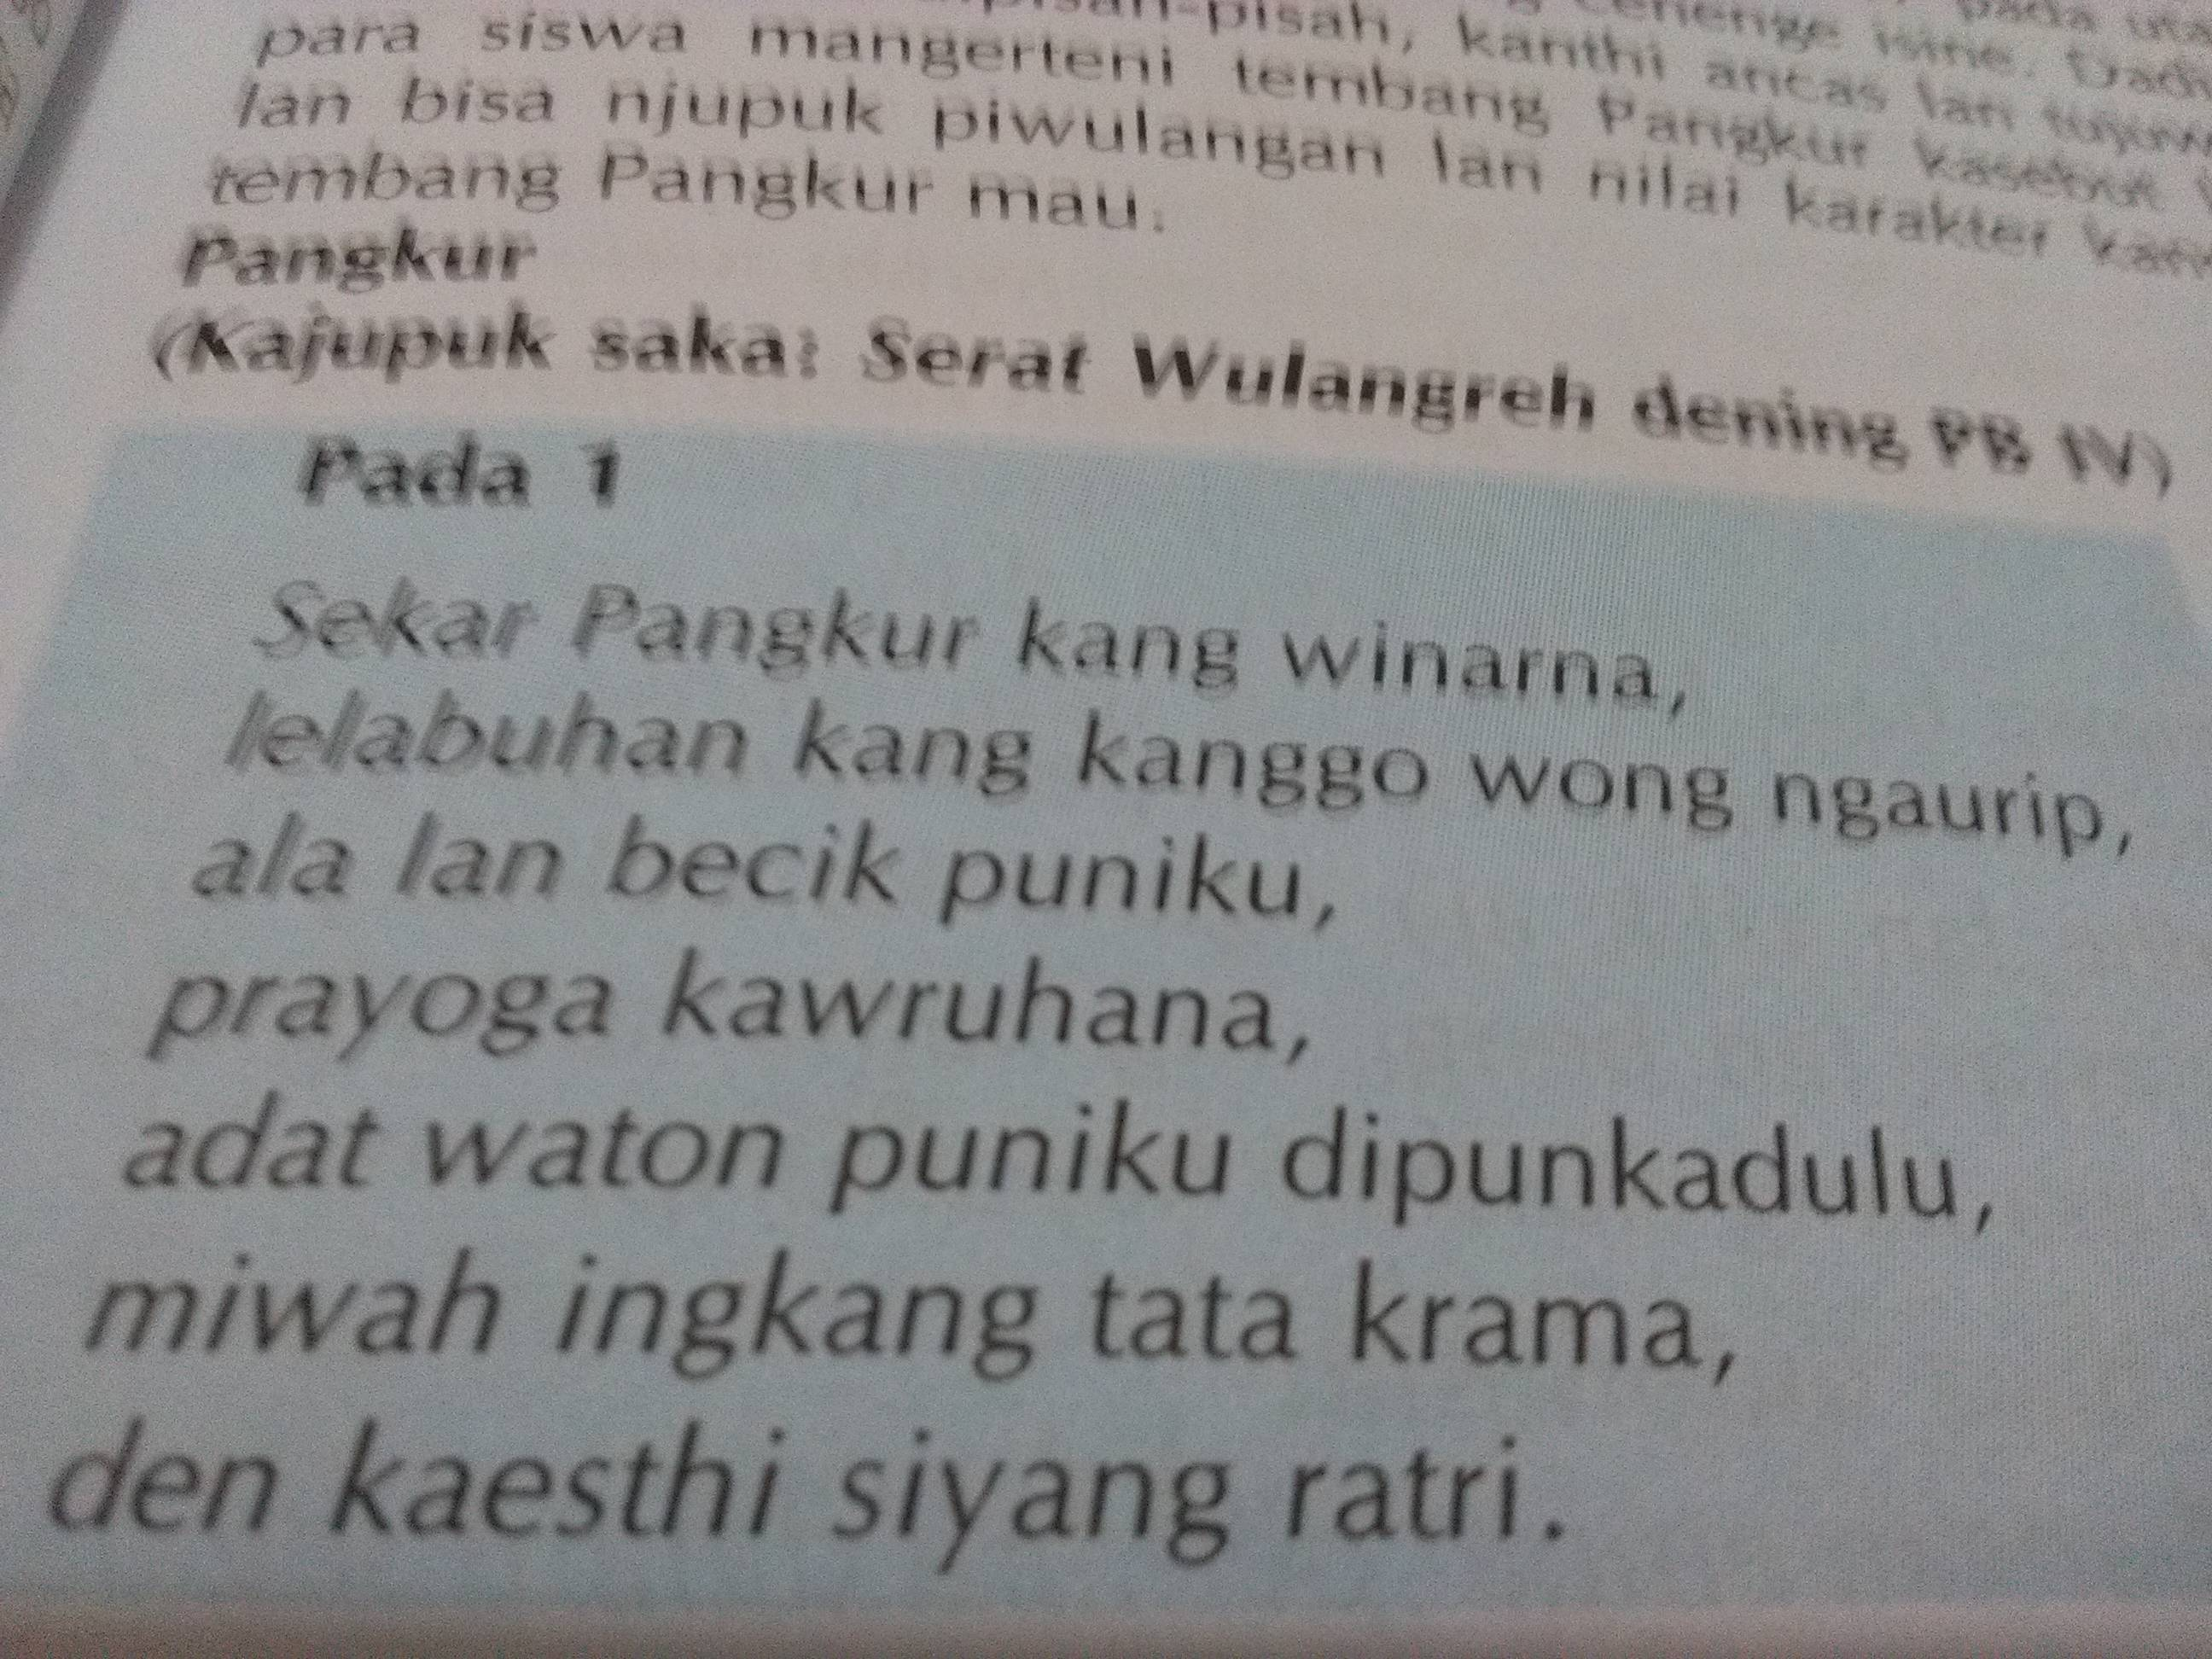 Mengganti Tulisan Tembang Pangkur Dgn Aksara Jawa Brainly Co Id